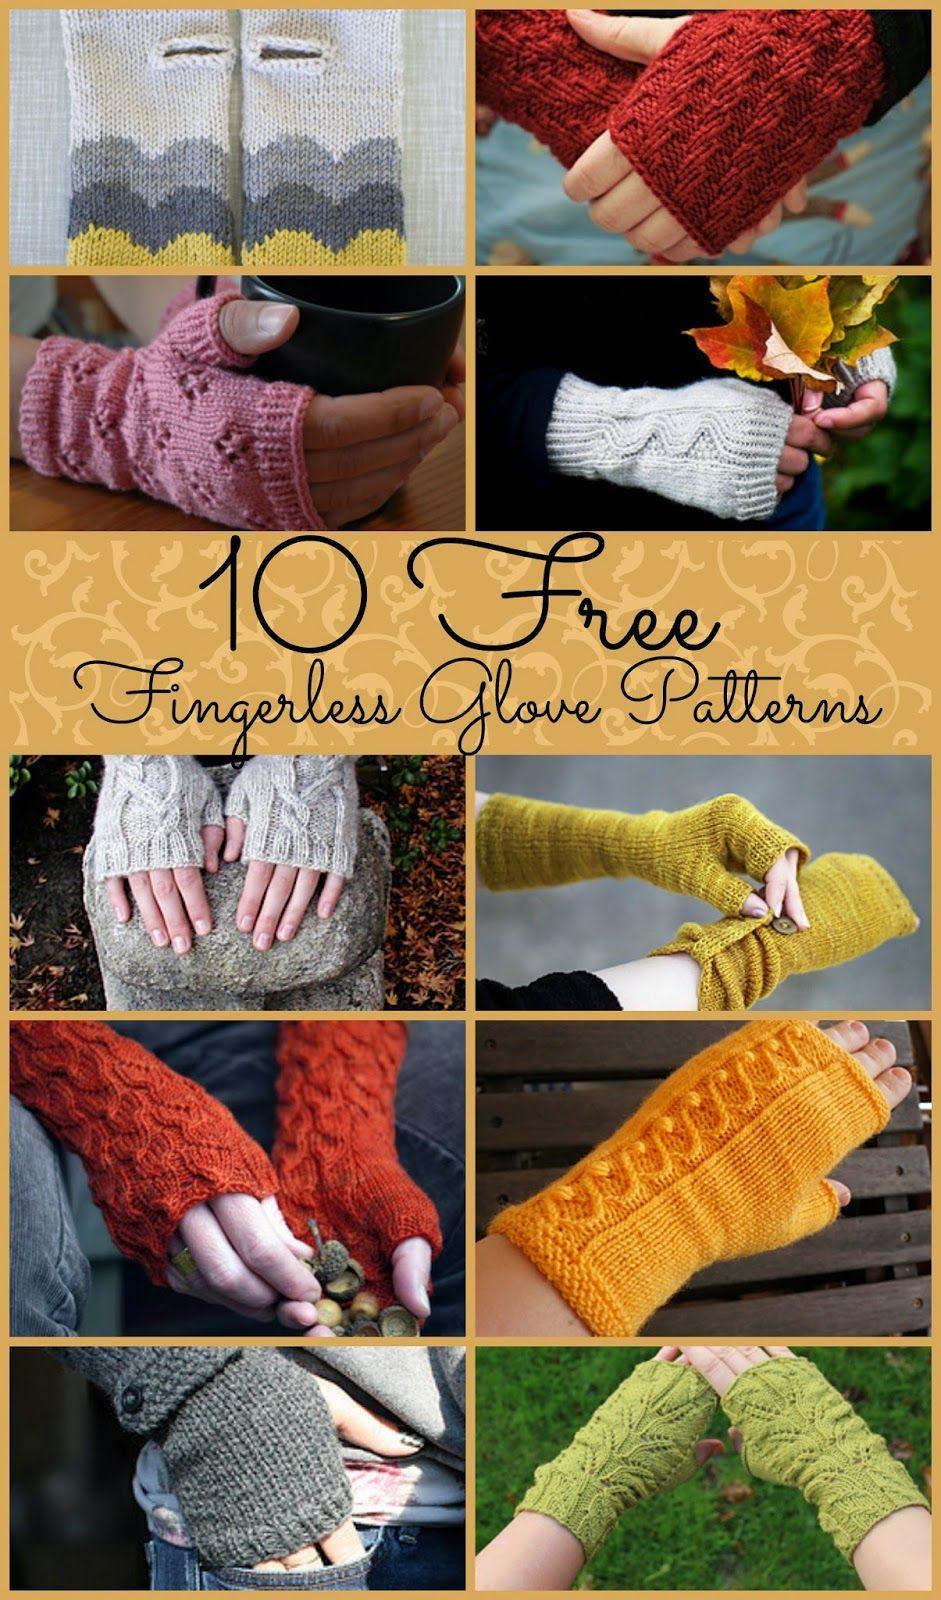 Chaleur: Fingerless Gloves For Fall   Lovely Knitting Projects ...